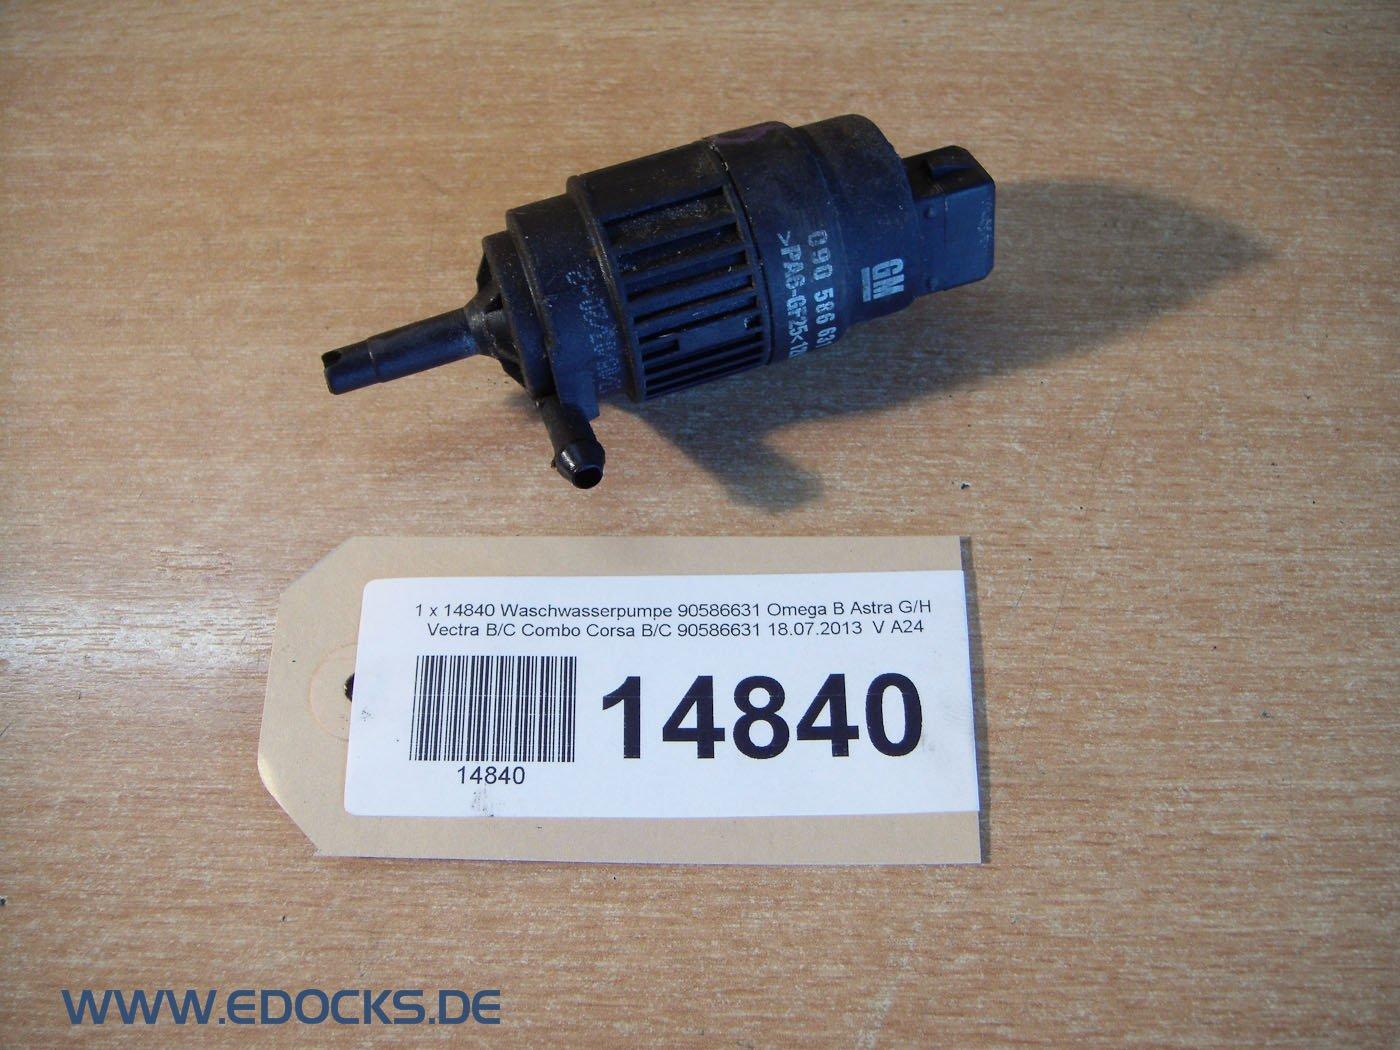 Bomba limpiaparabrisas 90586631 Omega B Astra G/H Vectra B/C Combo Corsa B/C Opel: Amazon.es: Coche y moto